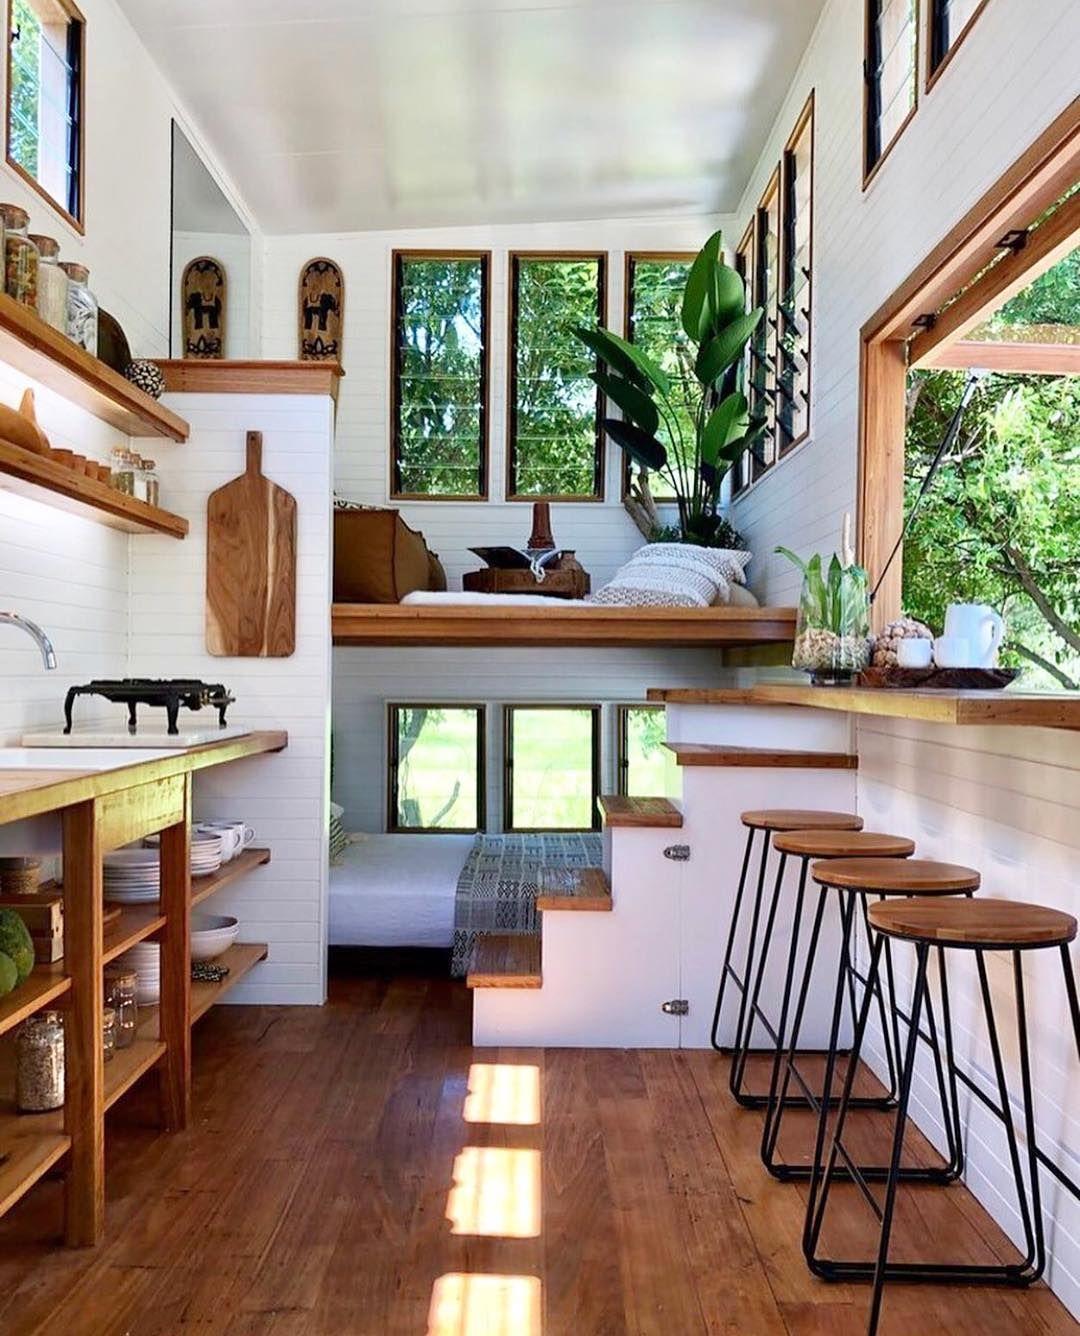 Omg I Just Found My Dream Home This Tiny House From Nbsp Nbsp Littlebyronco Nbsp Nbs Tiny House Living Room Tiny House Interior Design Tiny House Decor